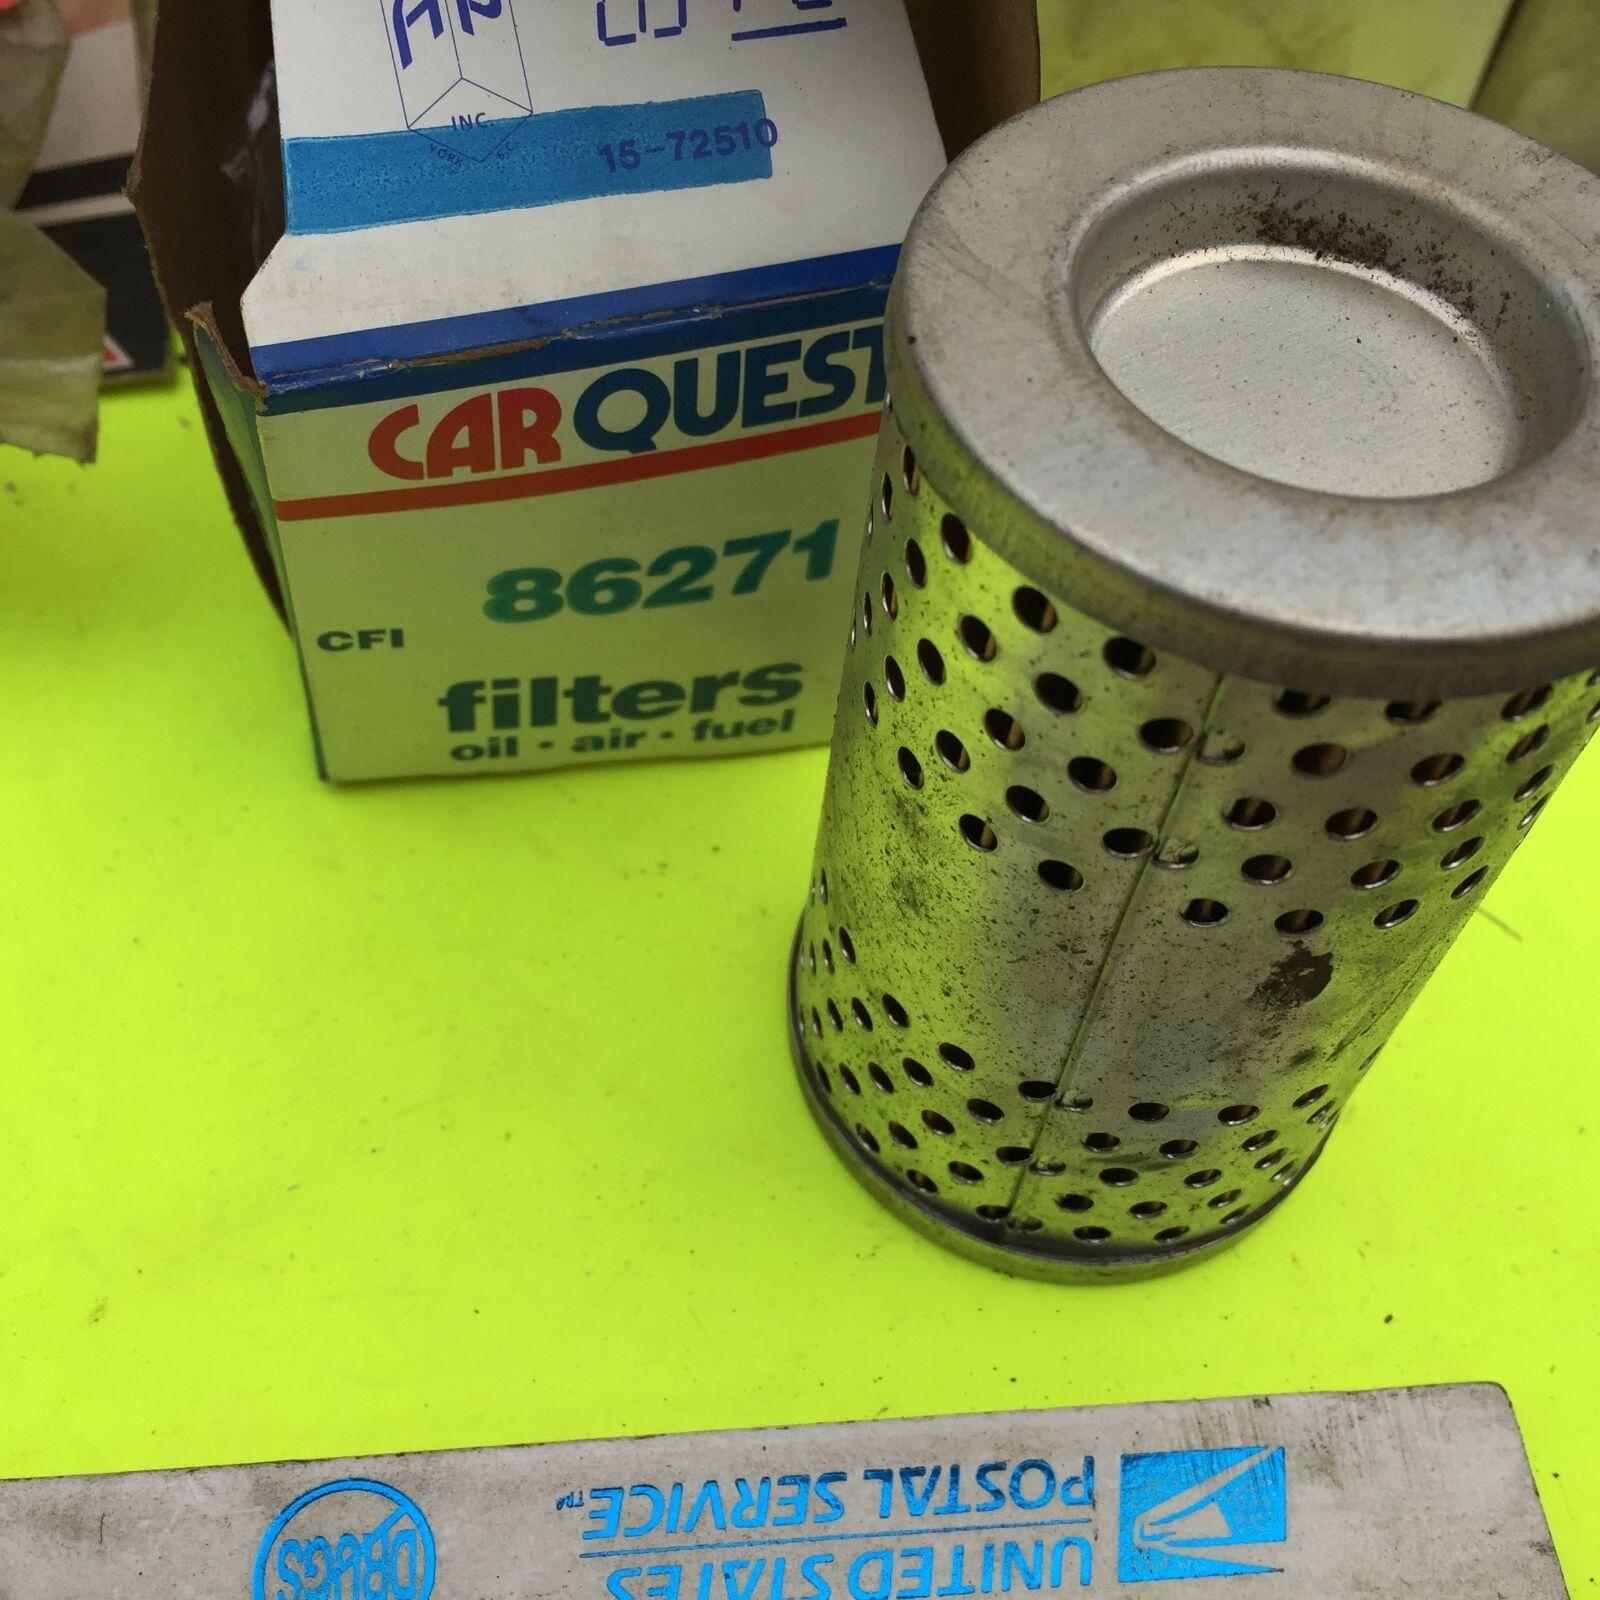 Carquest.  U.S. old cars,  filter.    Carquest  86271.       Item:  4668